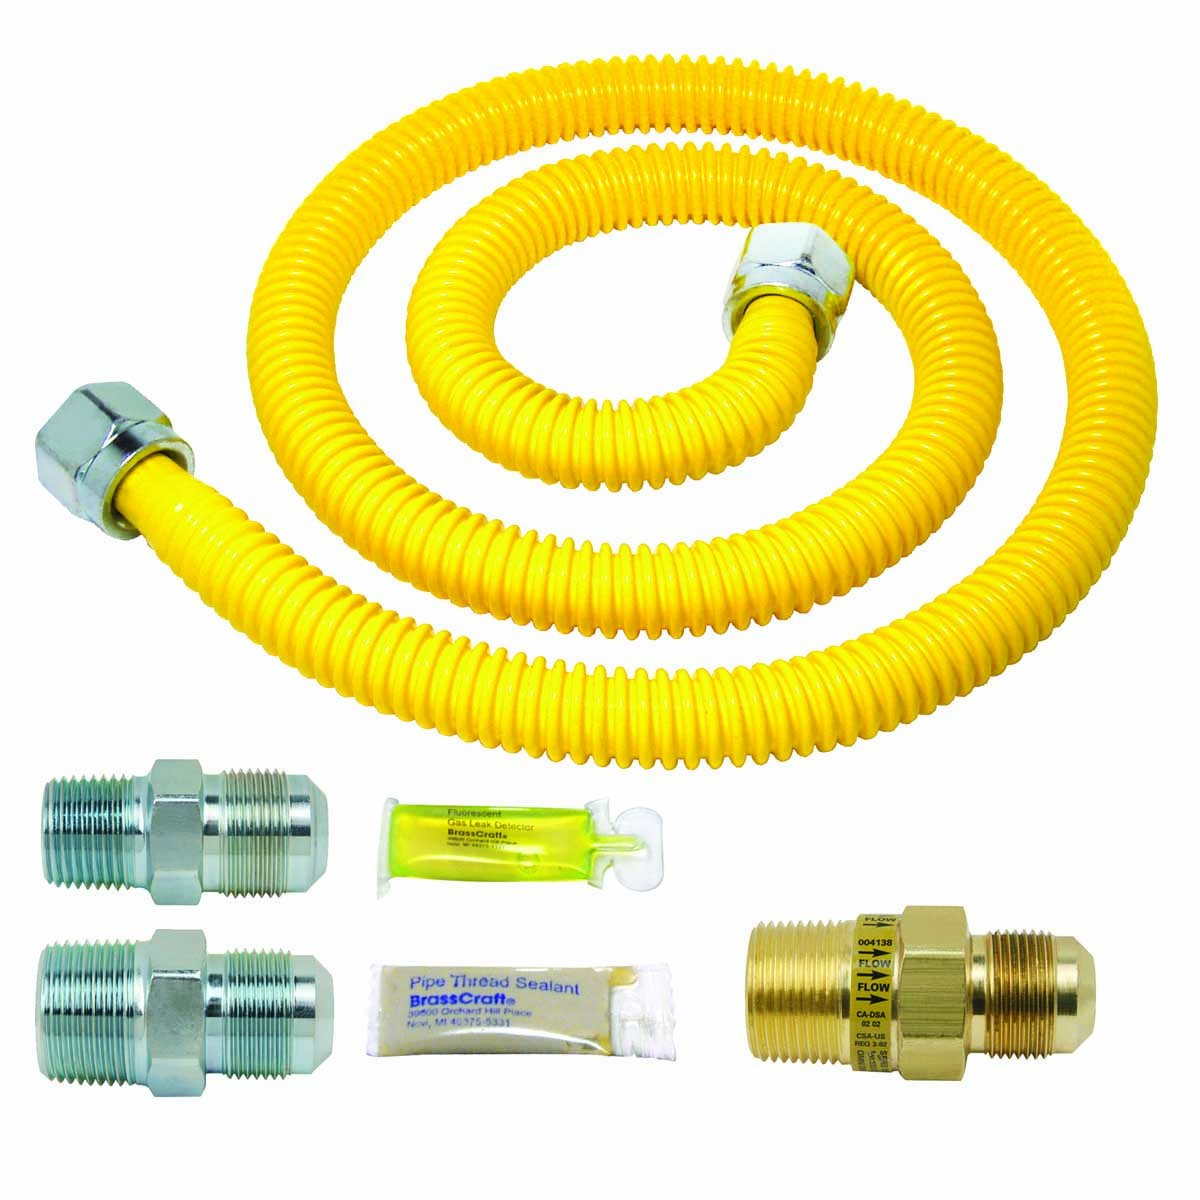 BrassCraft PSC1083 K5 Safety Plus Gas Installation Kit for Range Furnace and Boiler